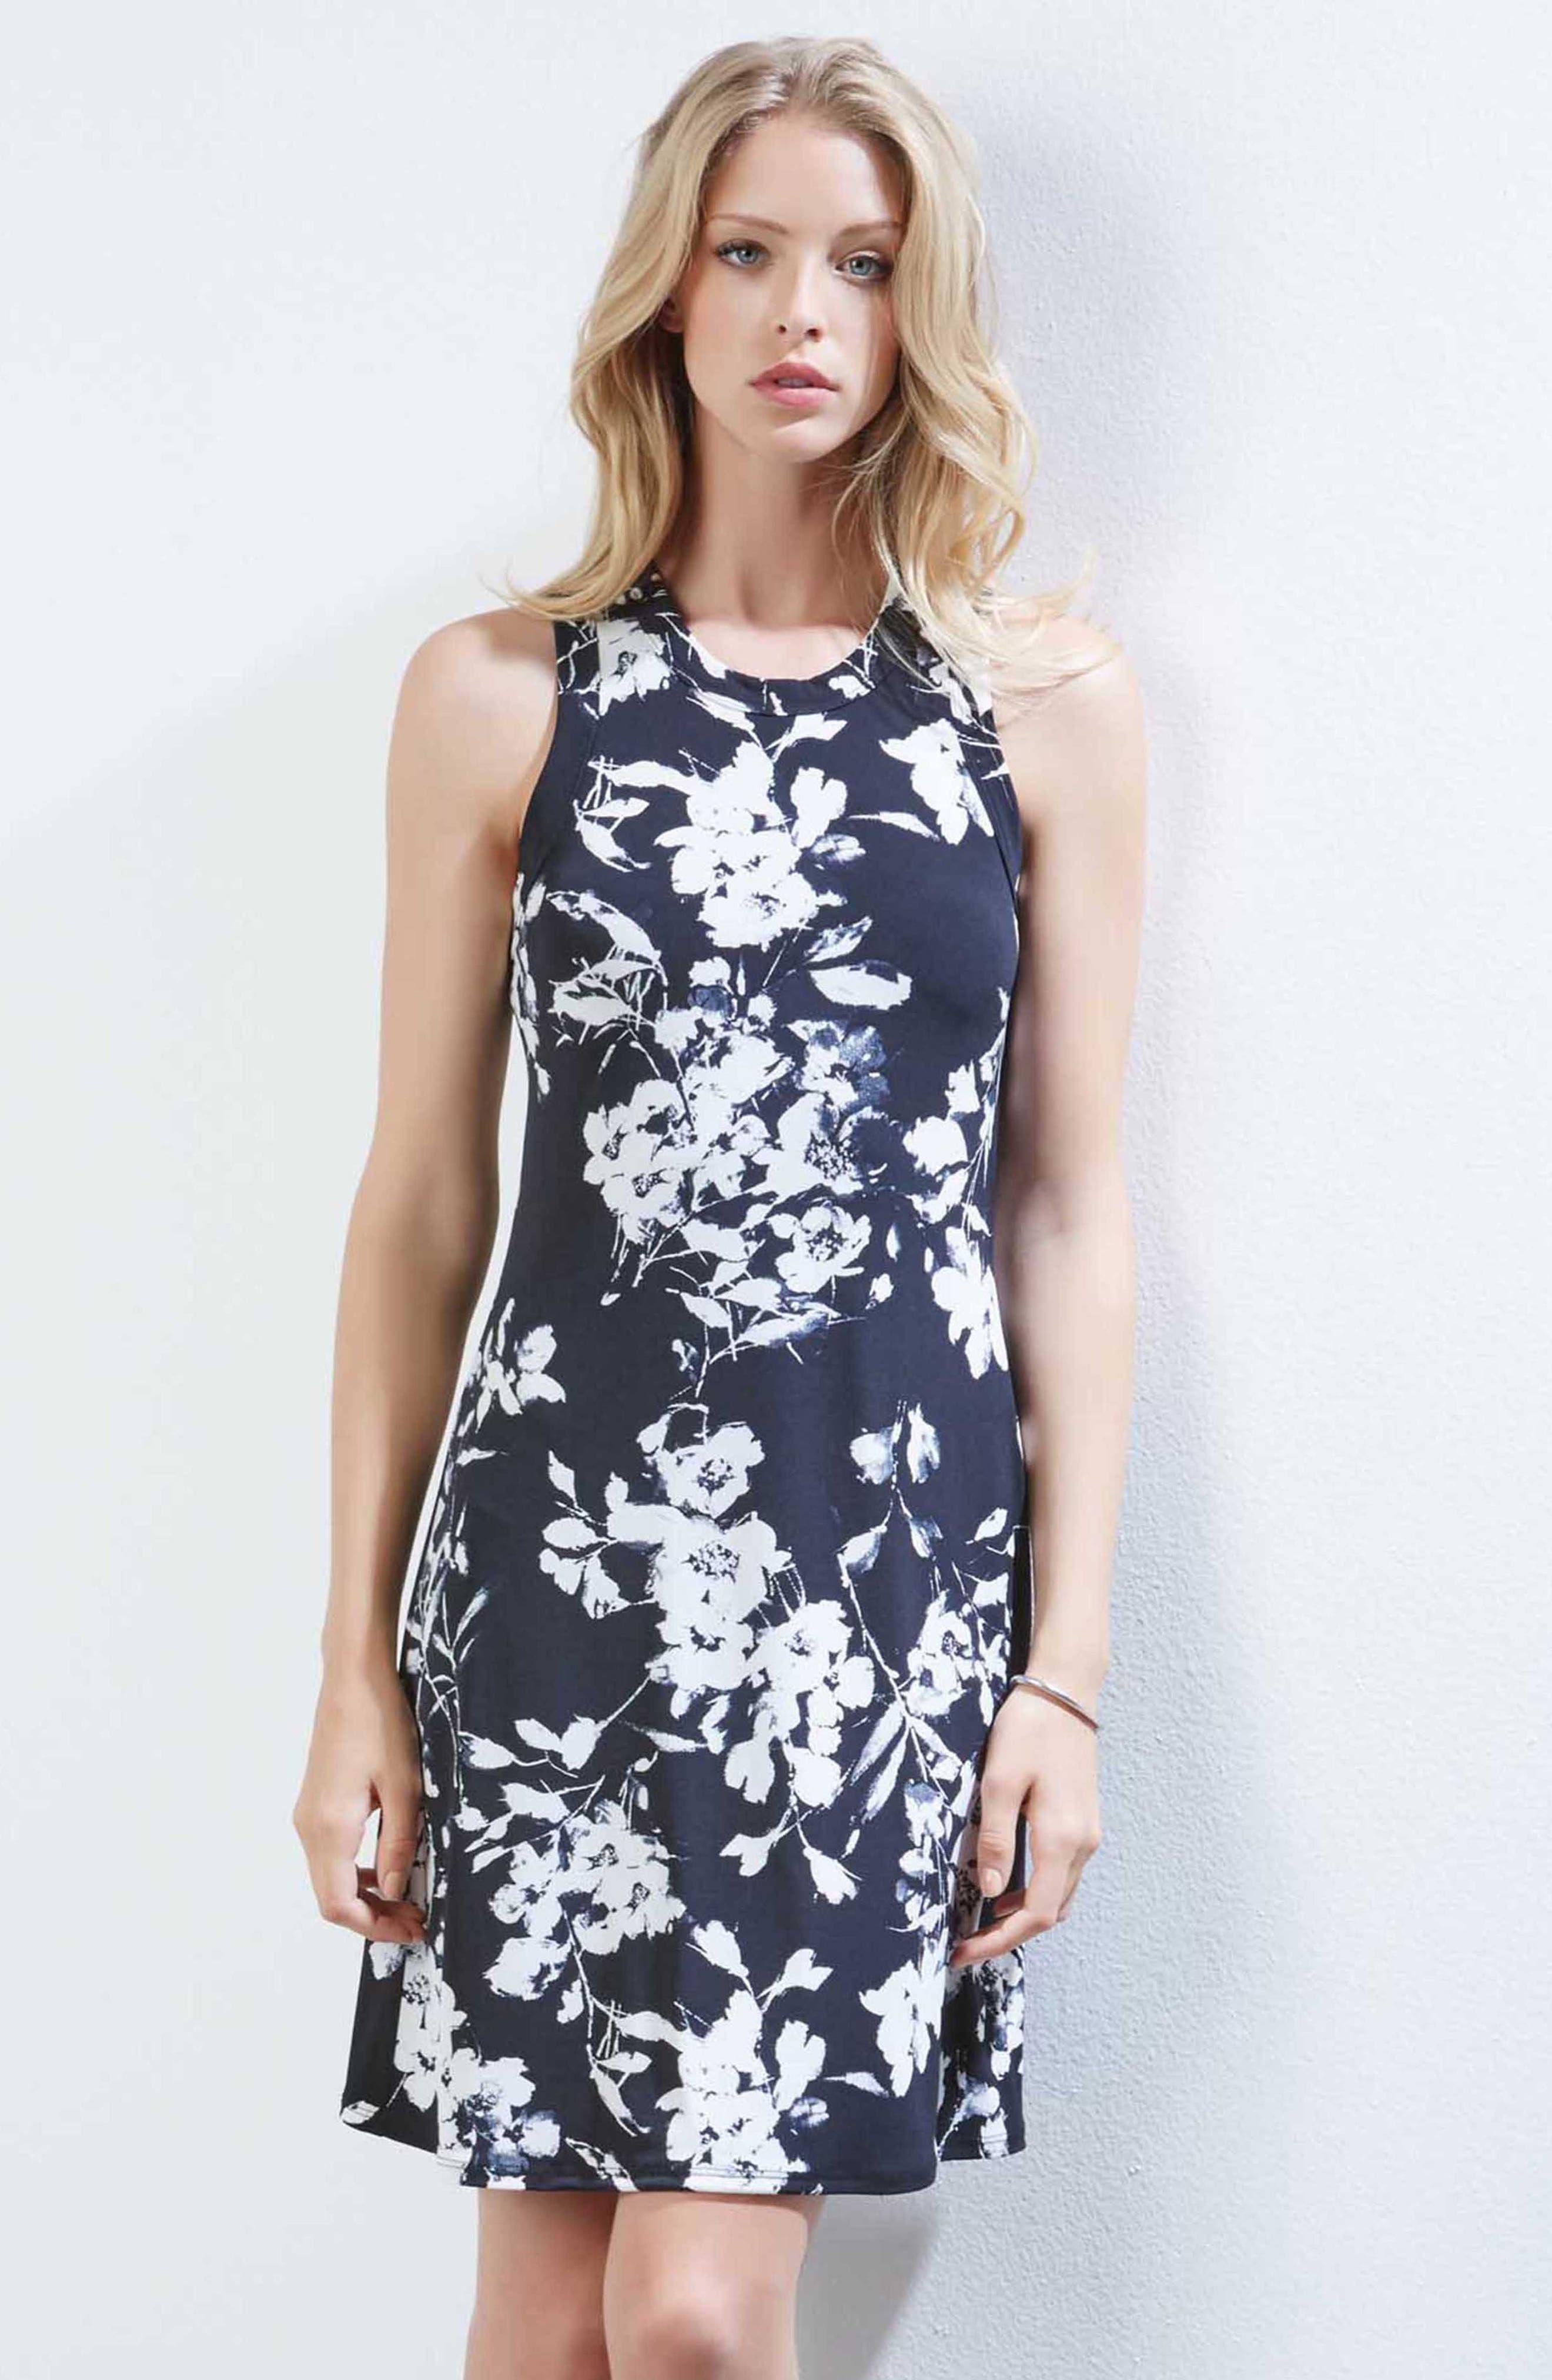 Floral Print Knit Dress,                             Alternate thumbnail 3, color,                             Black/ Off White